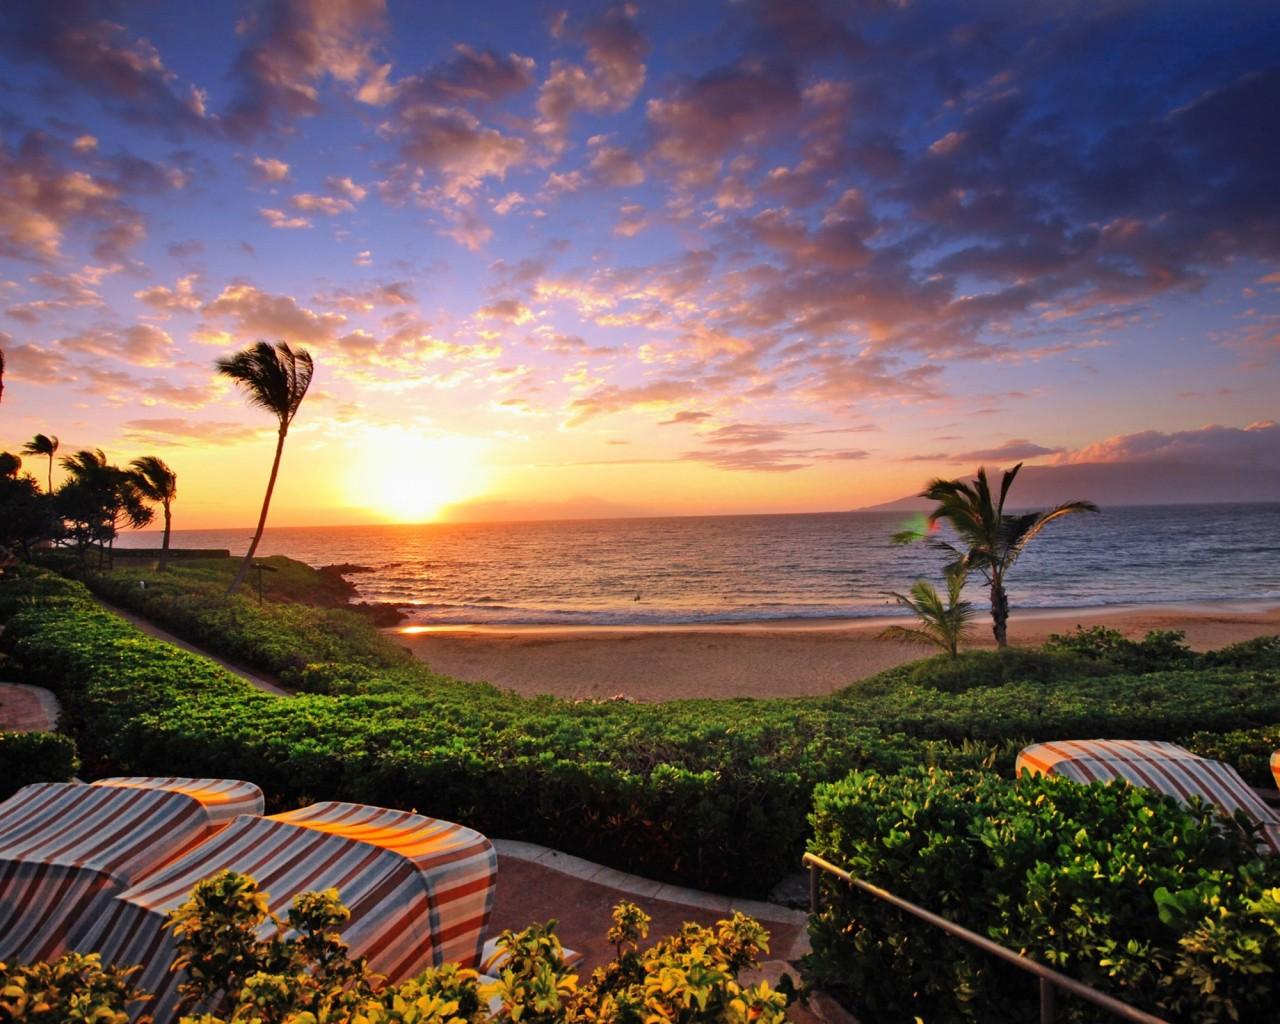 hawaii sunset wallpaper,sky,nature,ocean,natural landscape,property